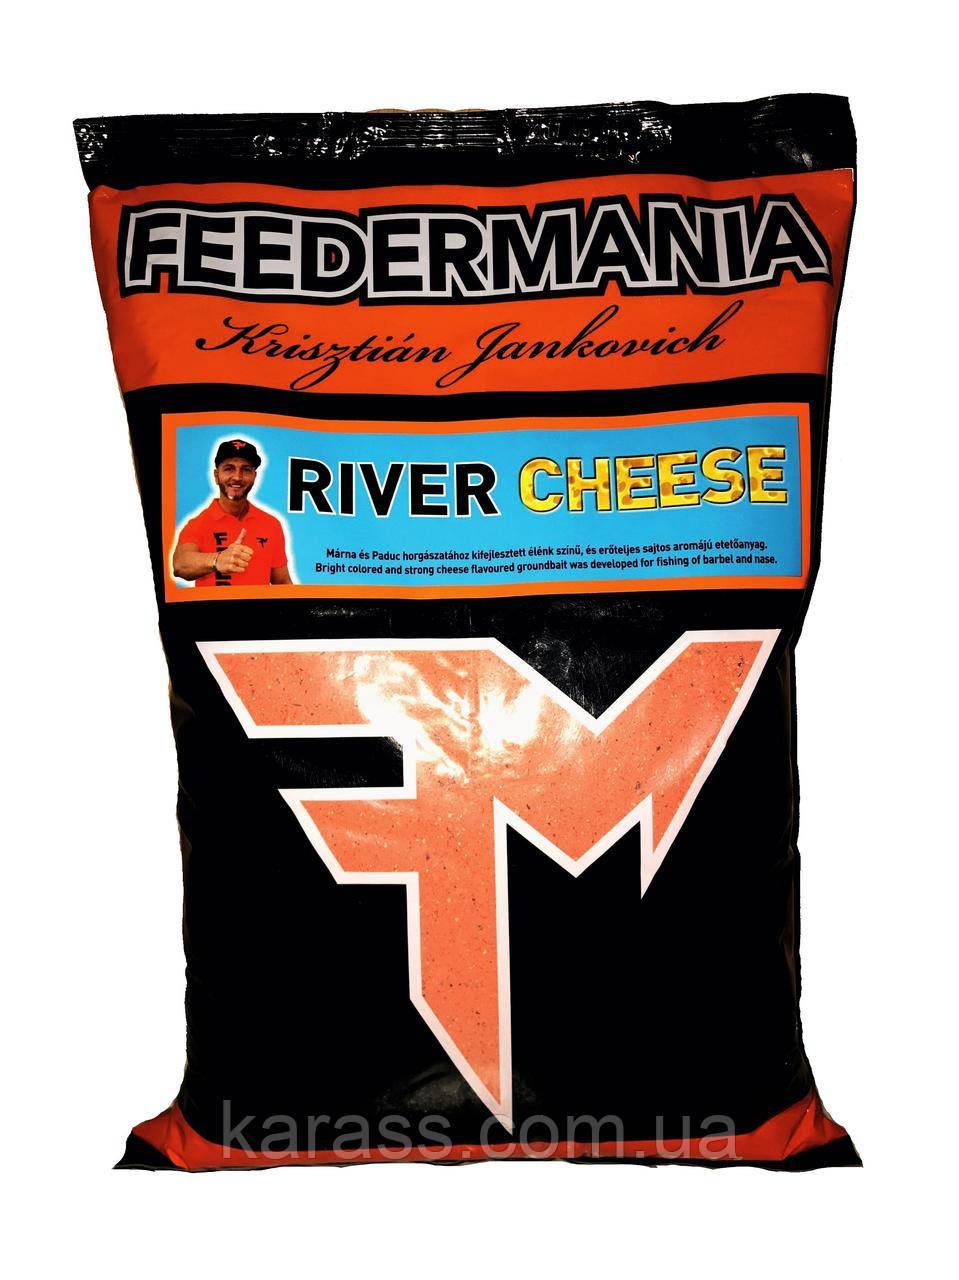 FEEDERMANIA River Cheese